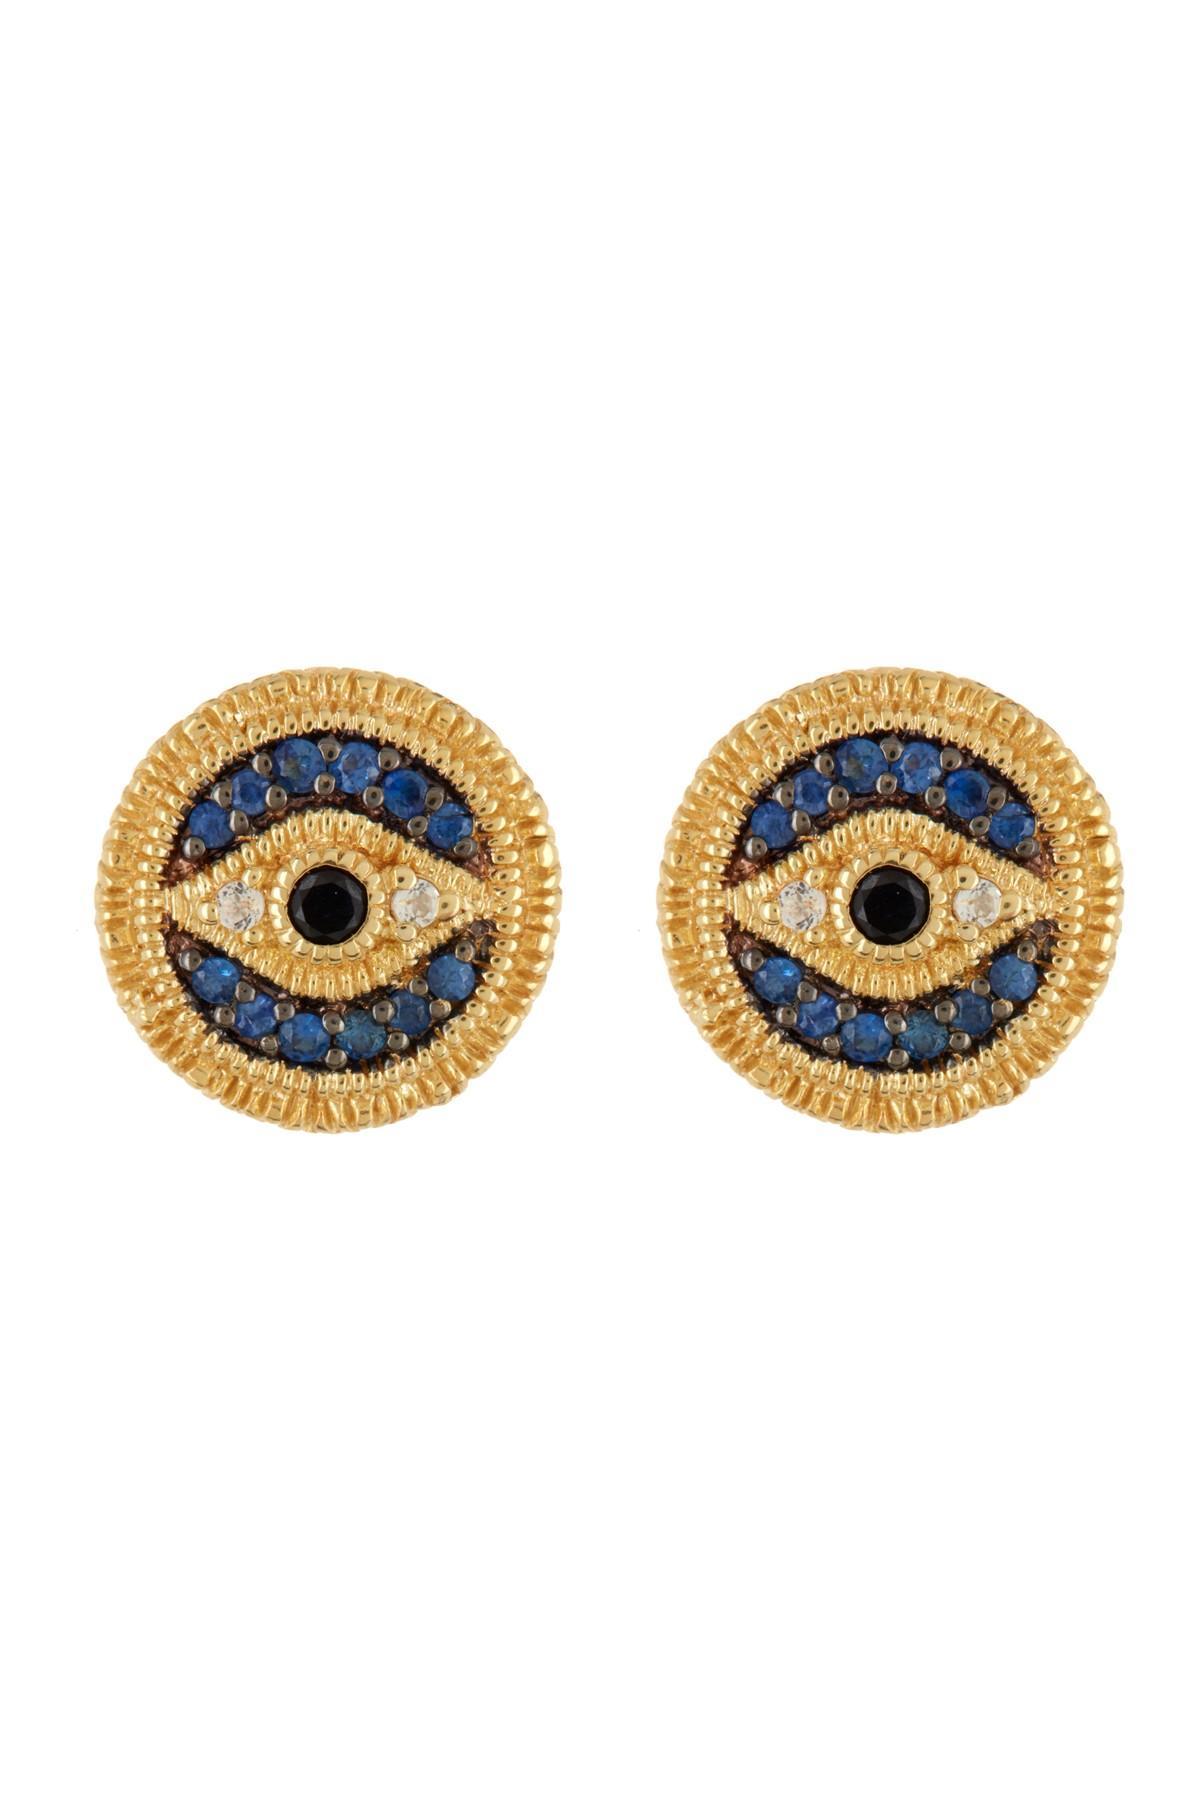 d568f7b0d Lyst - Judith Ripka Gold Vermeil Evil Eye Stud Earrings